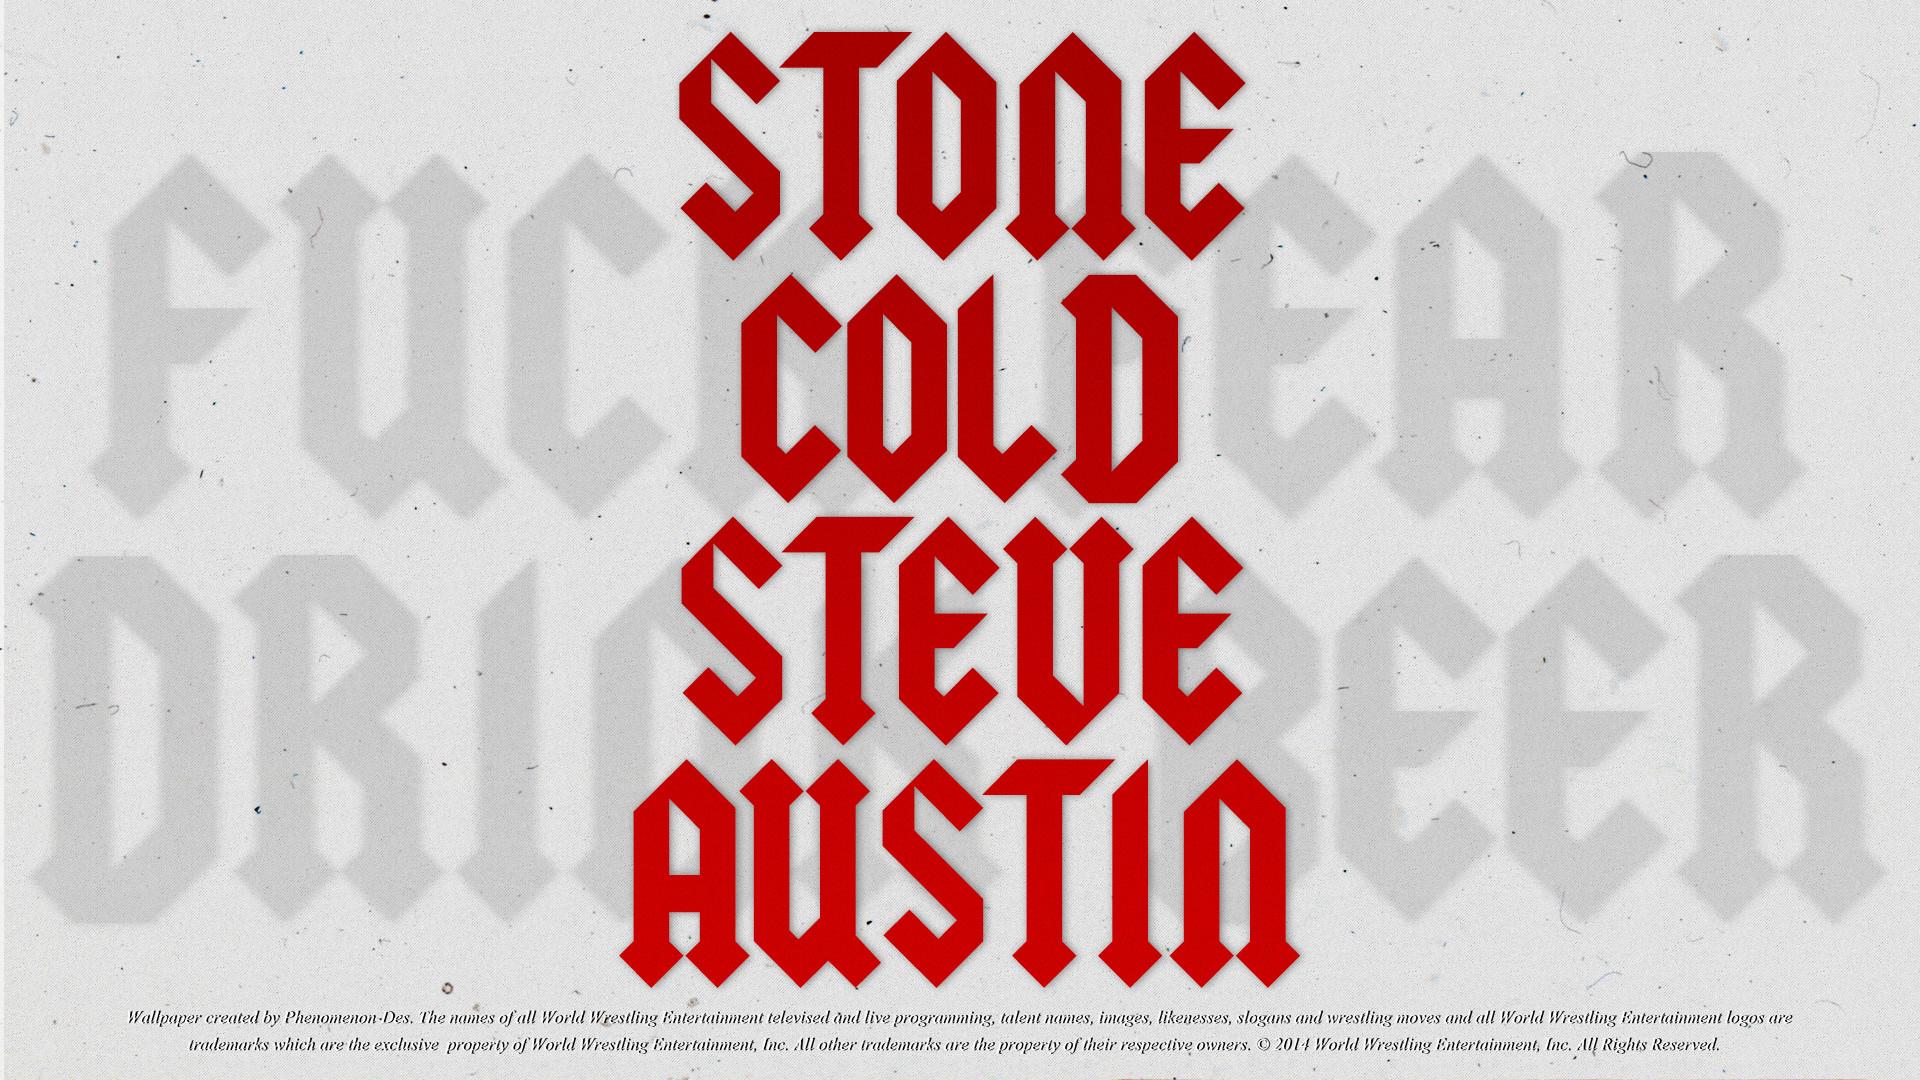 … WWE Stone Cold Steve Austin Wallpaper by Phenomenon-Des